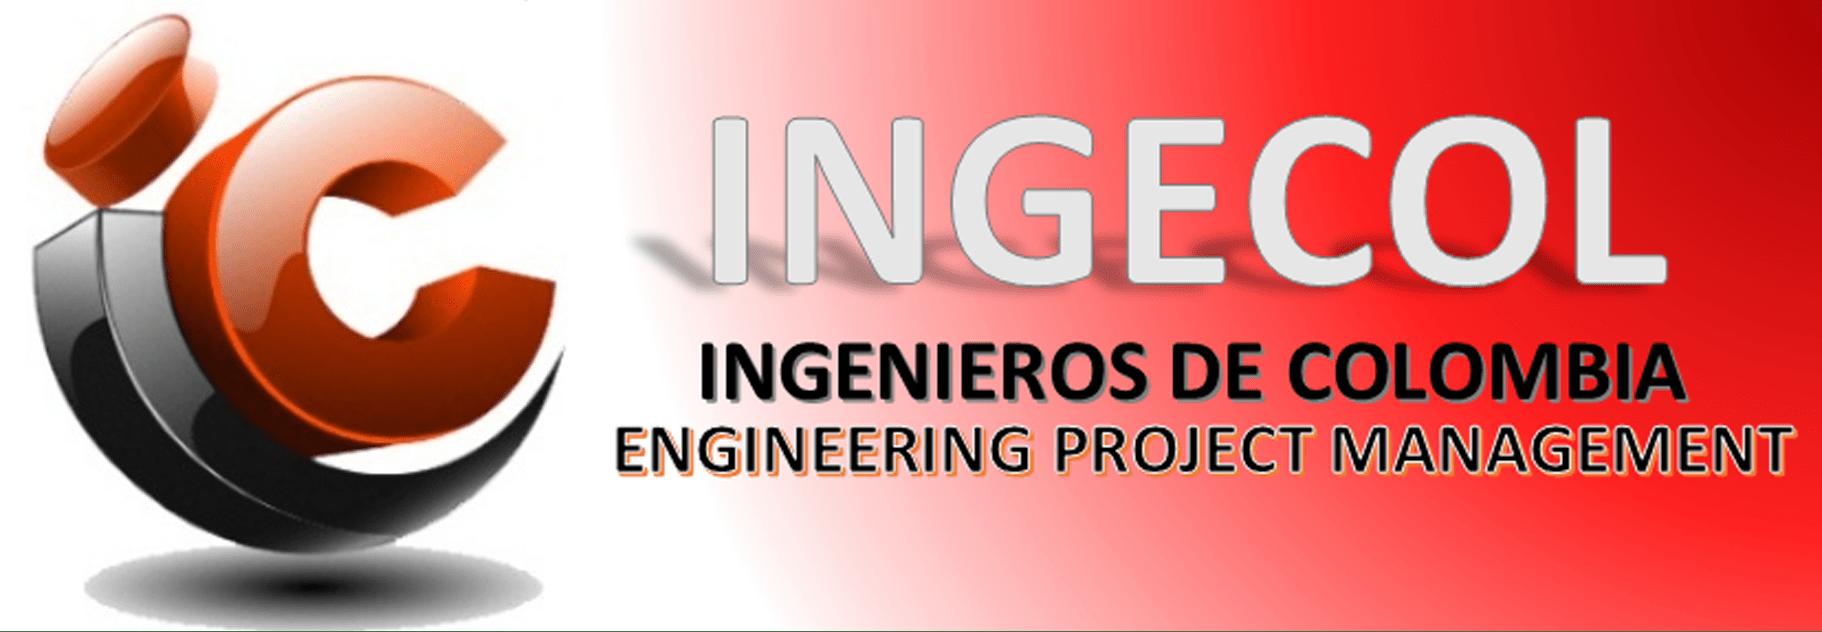 INGECOL S.A.S